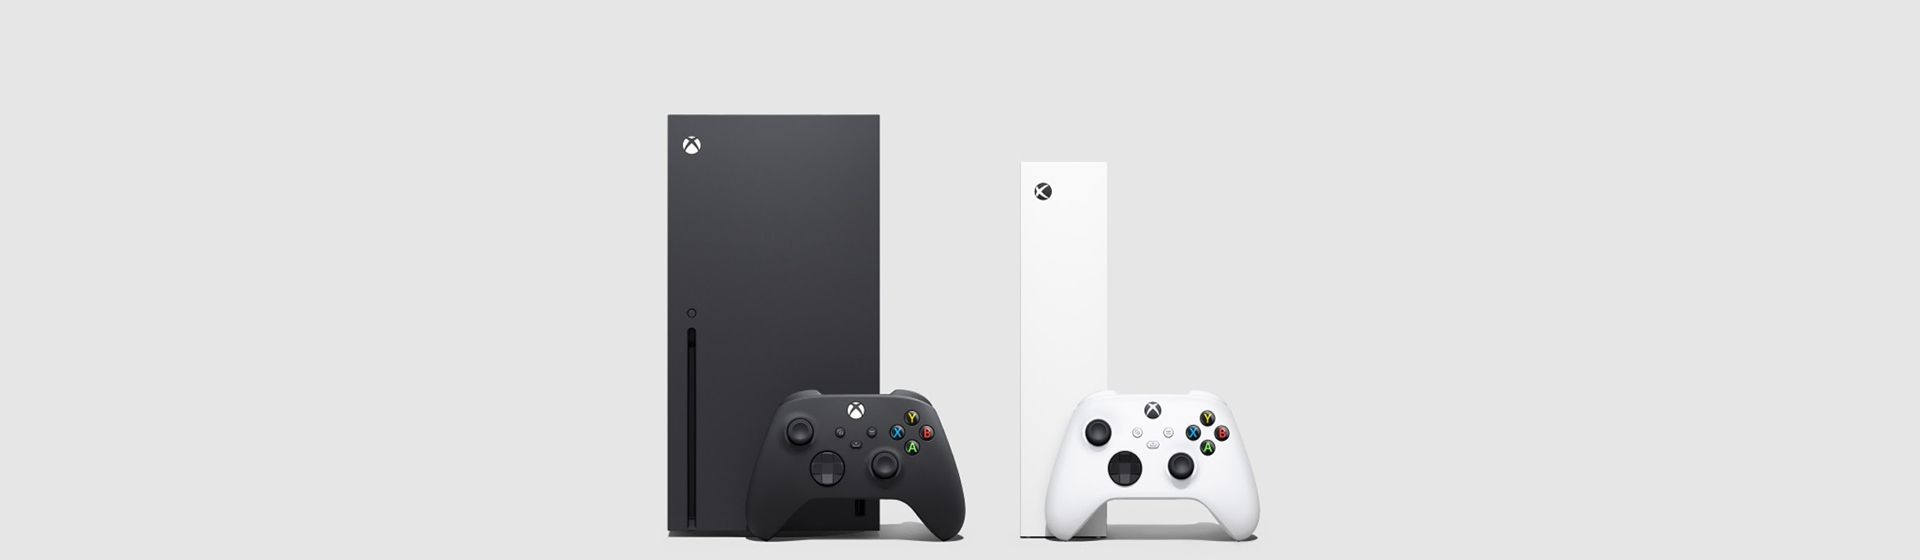 Vendas do Xbox One X aumentam em 747% na Amazon